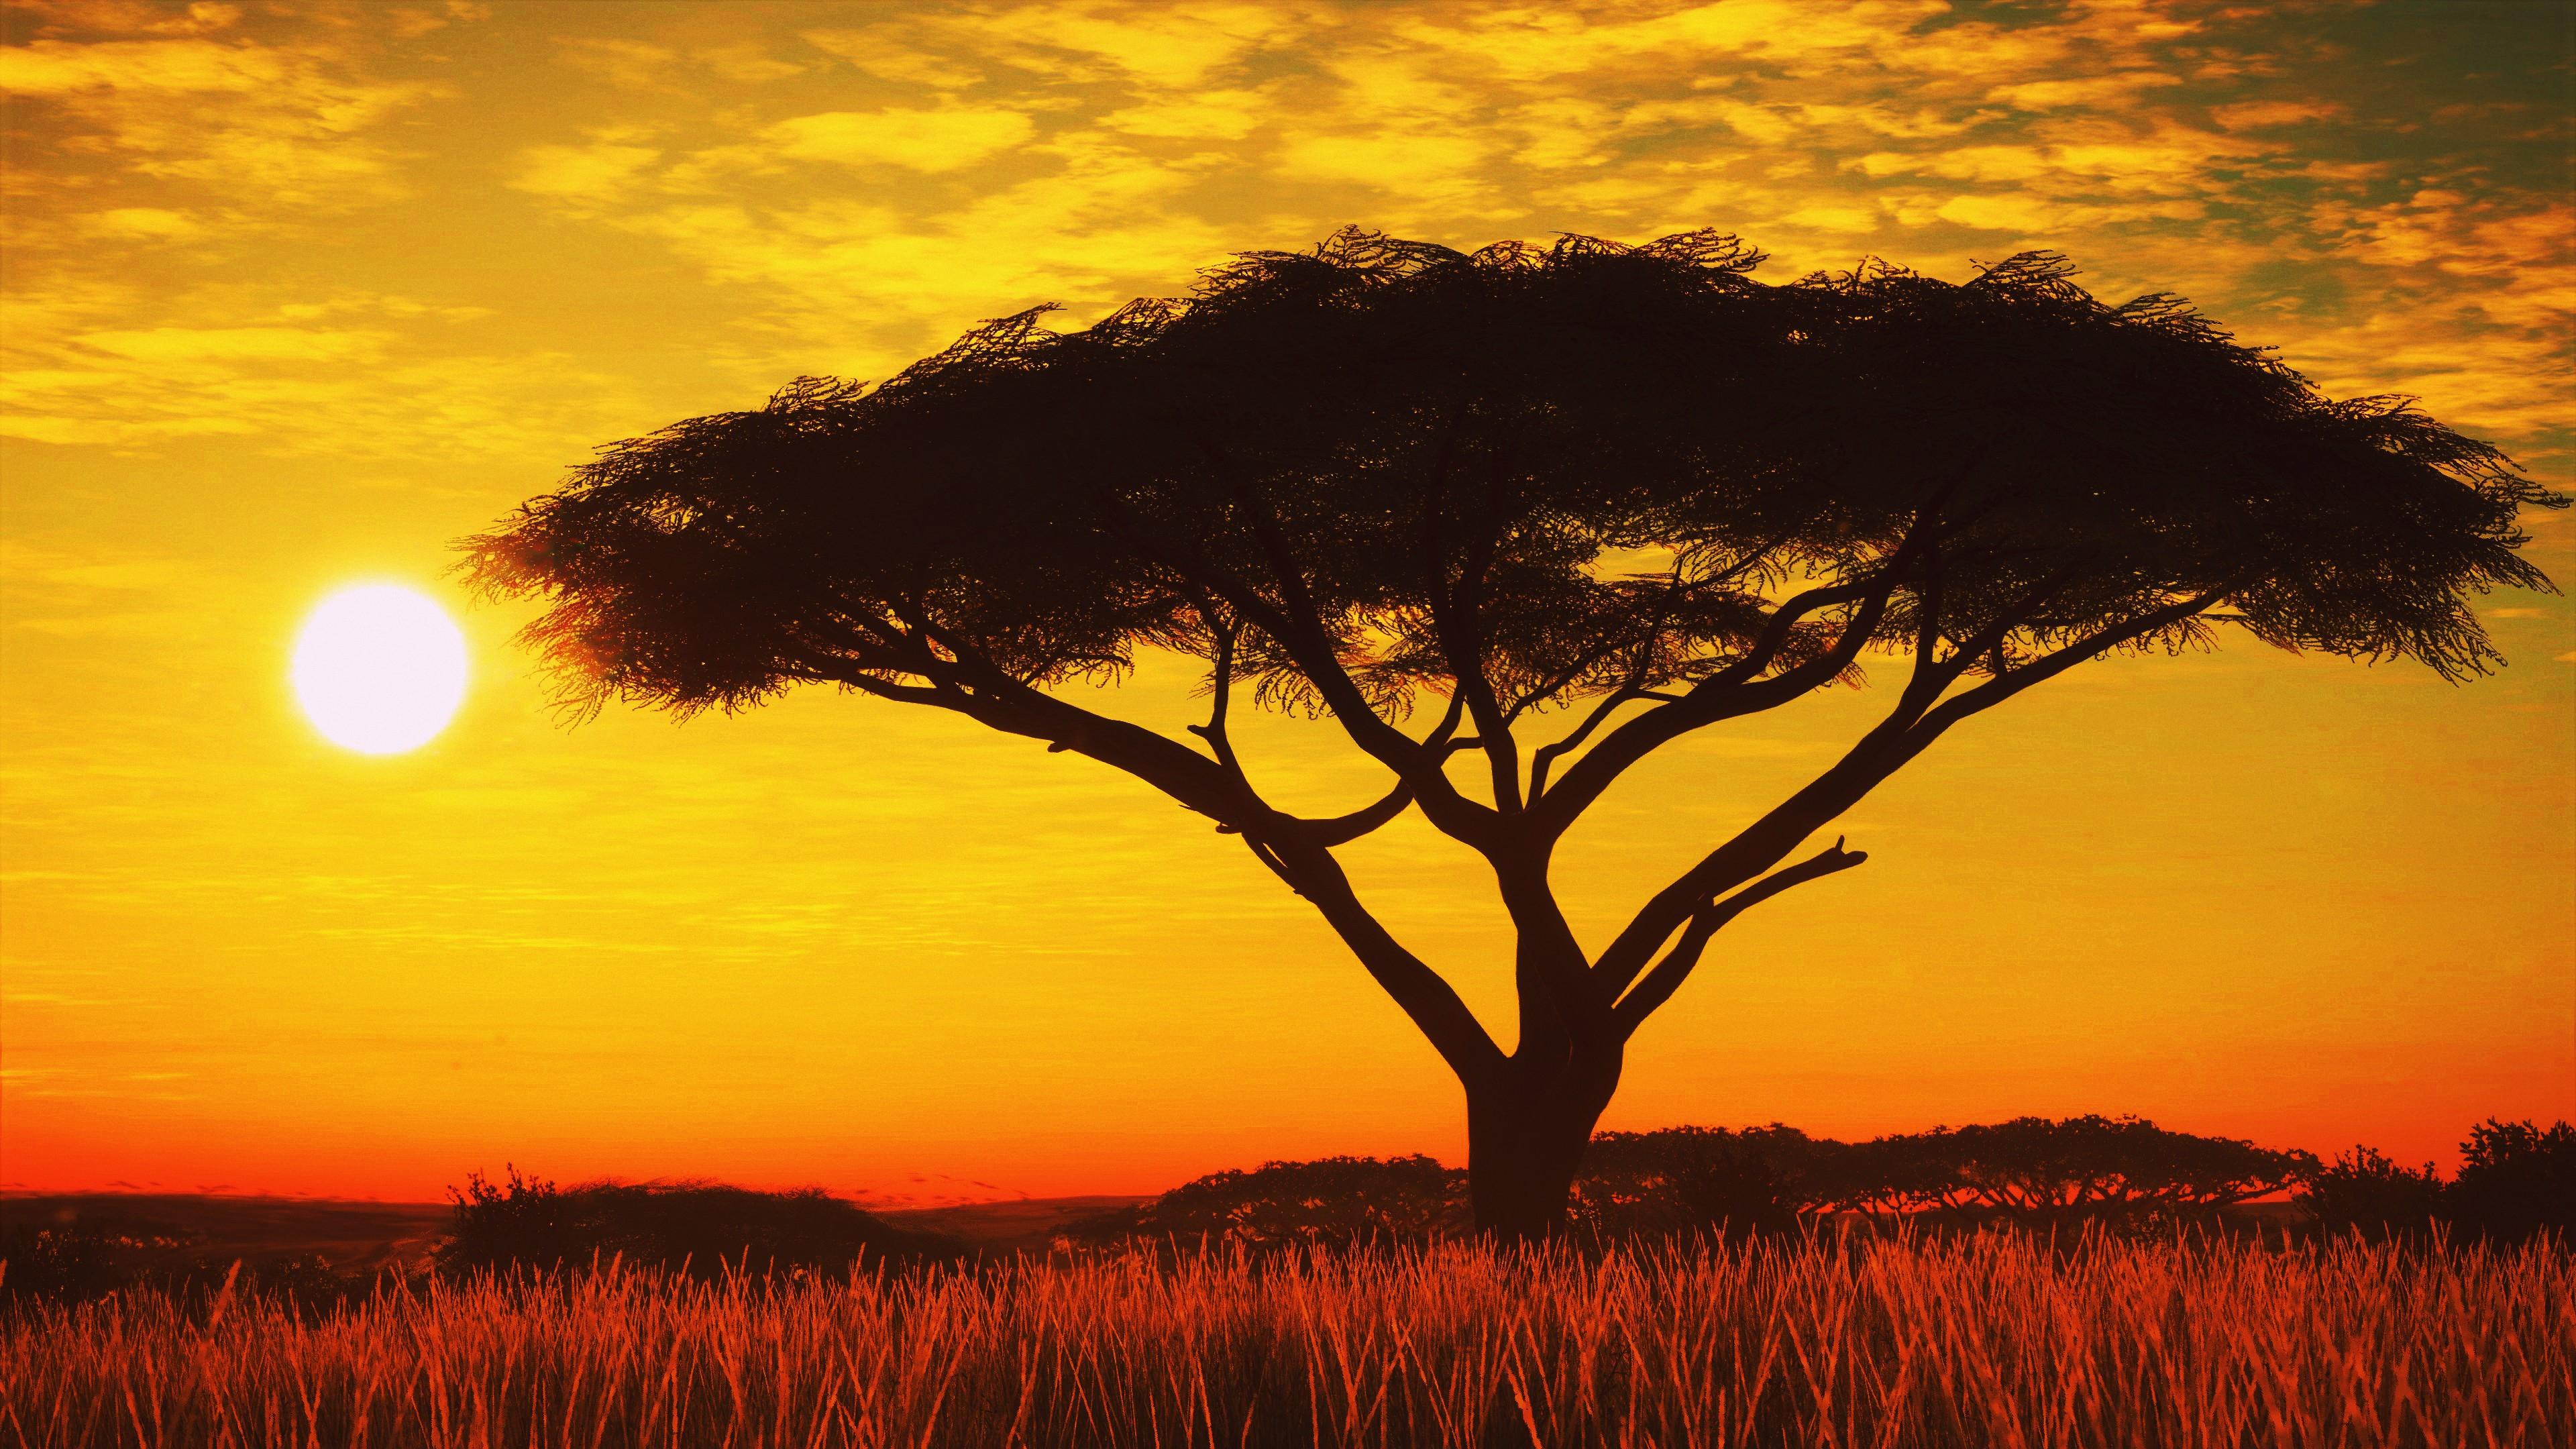 Serengeti Sunset 4k Hd Nature 4k Wallpapers Images